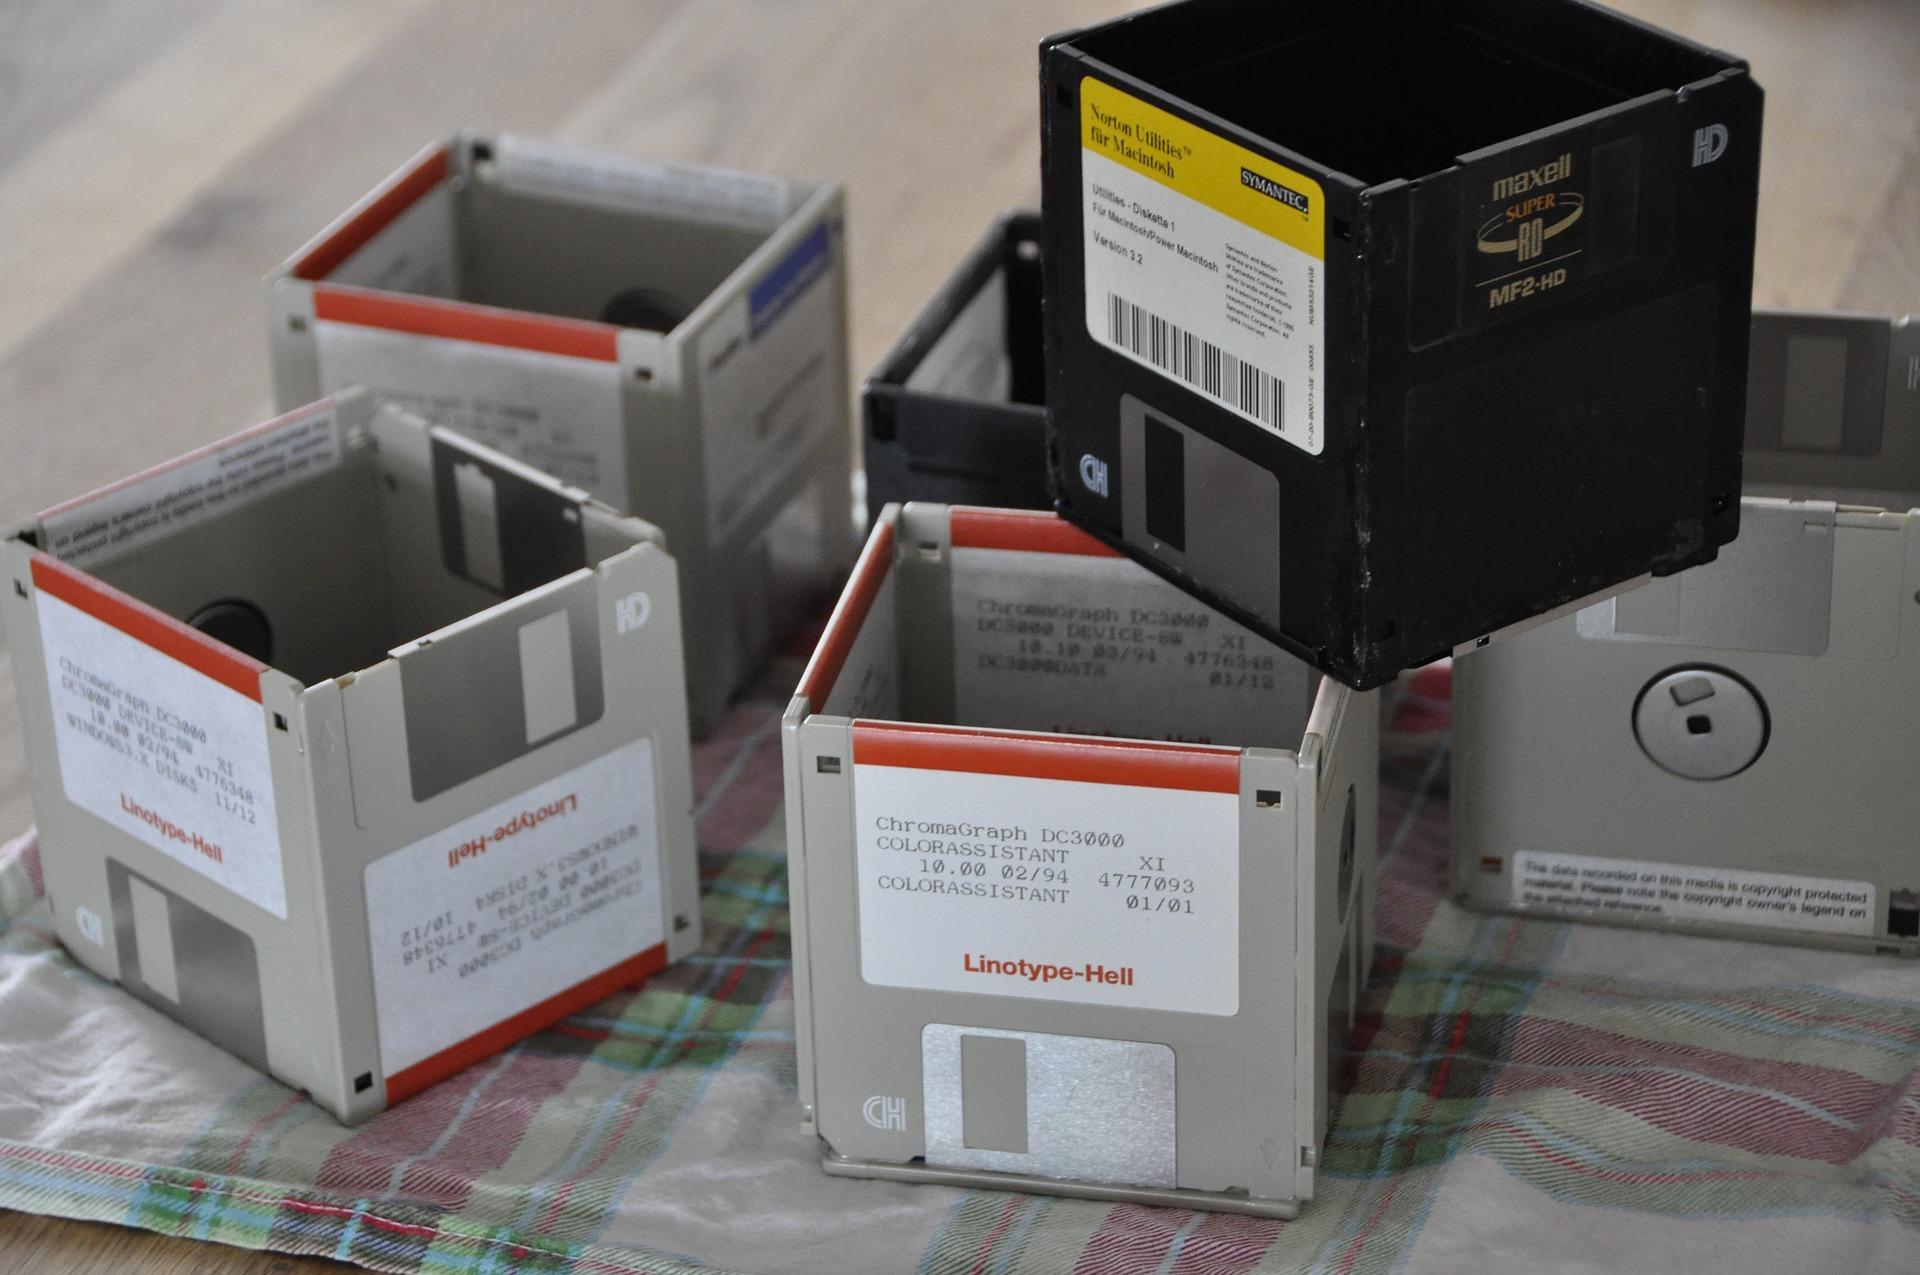 Disketten Box